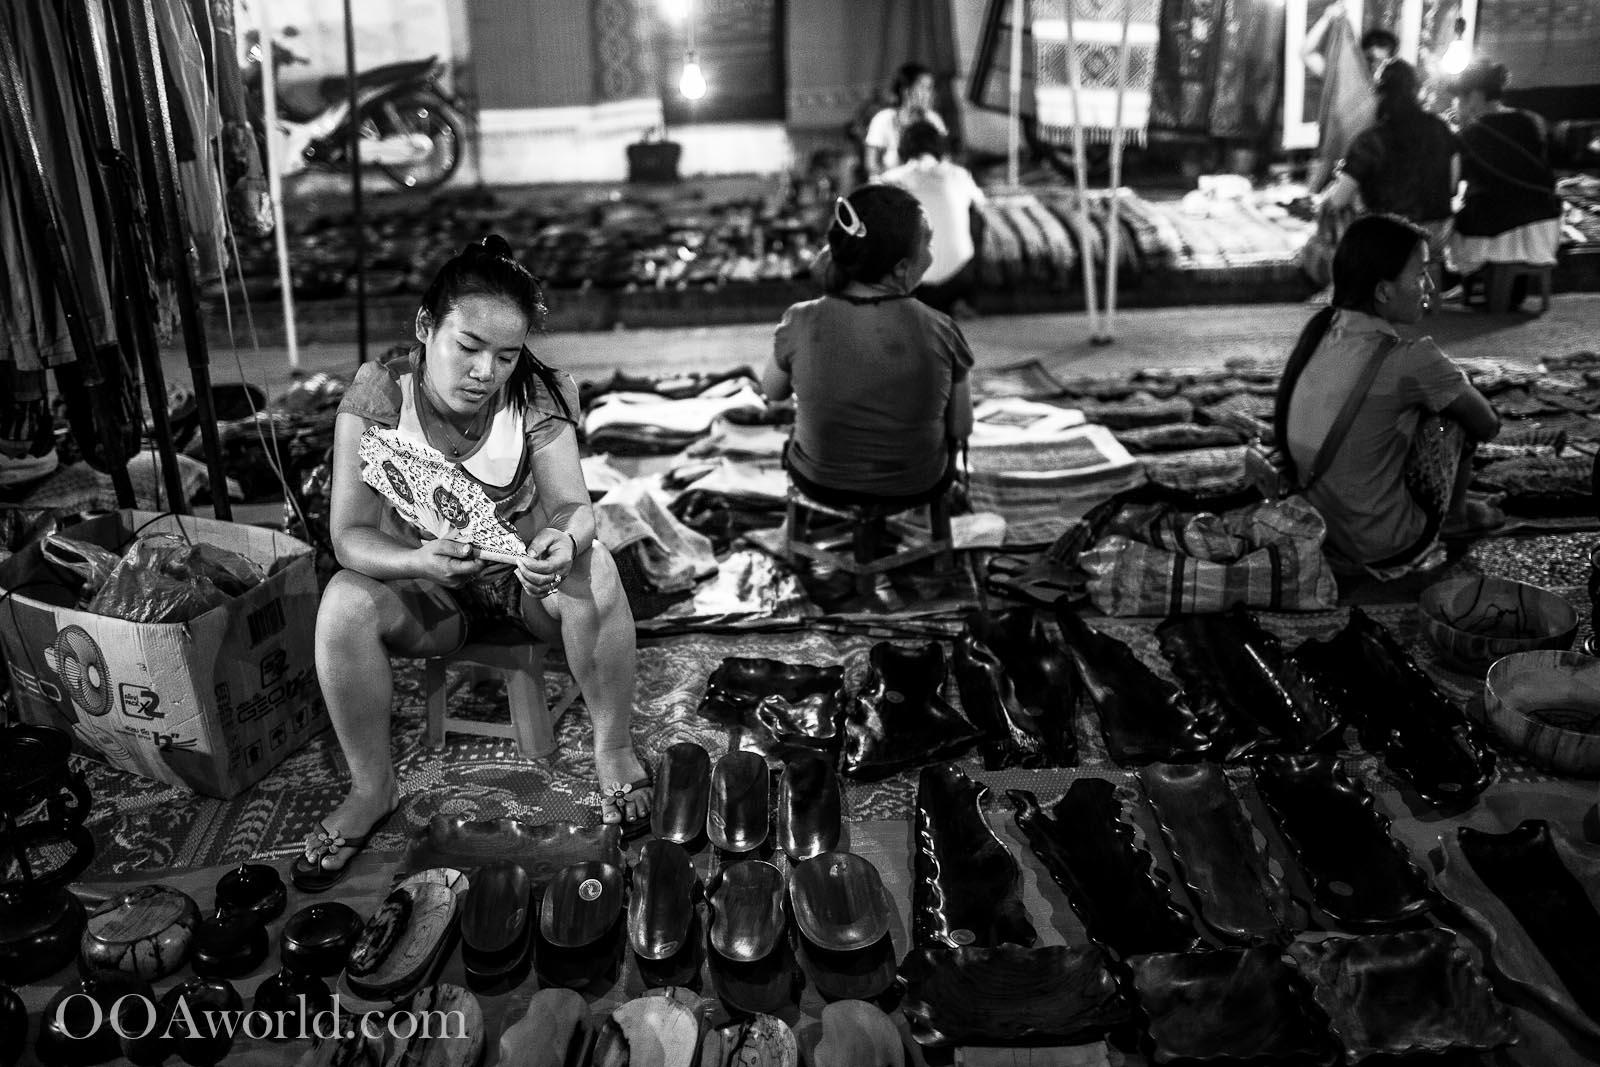 Girl Selling Shoes at the Luang Prabang Market Photo Ooaworld